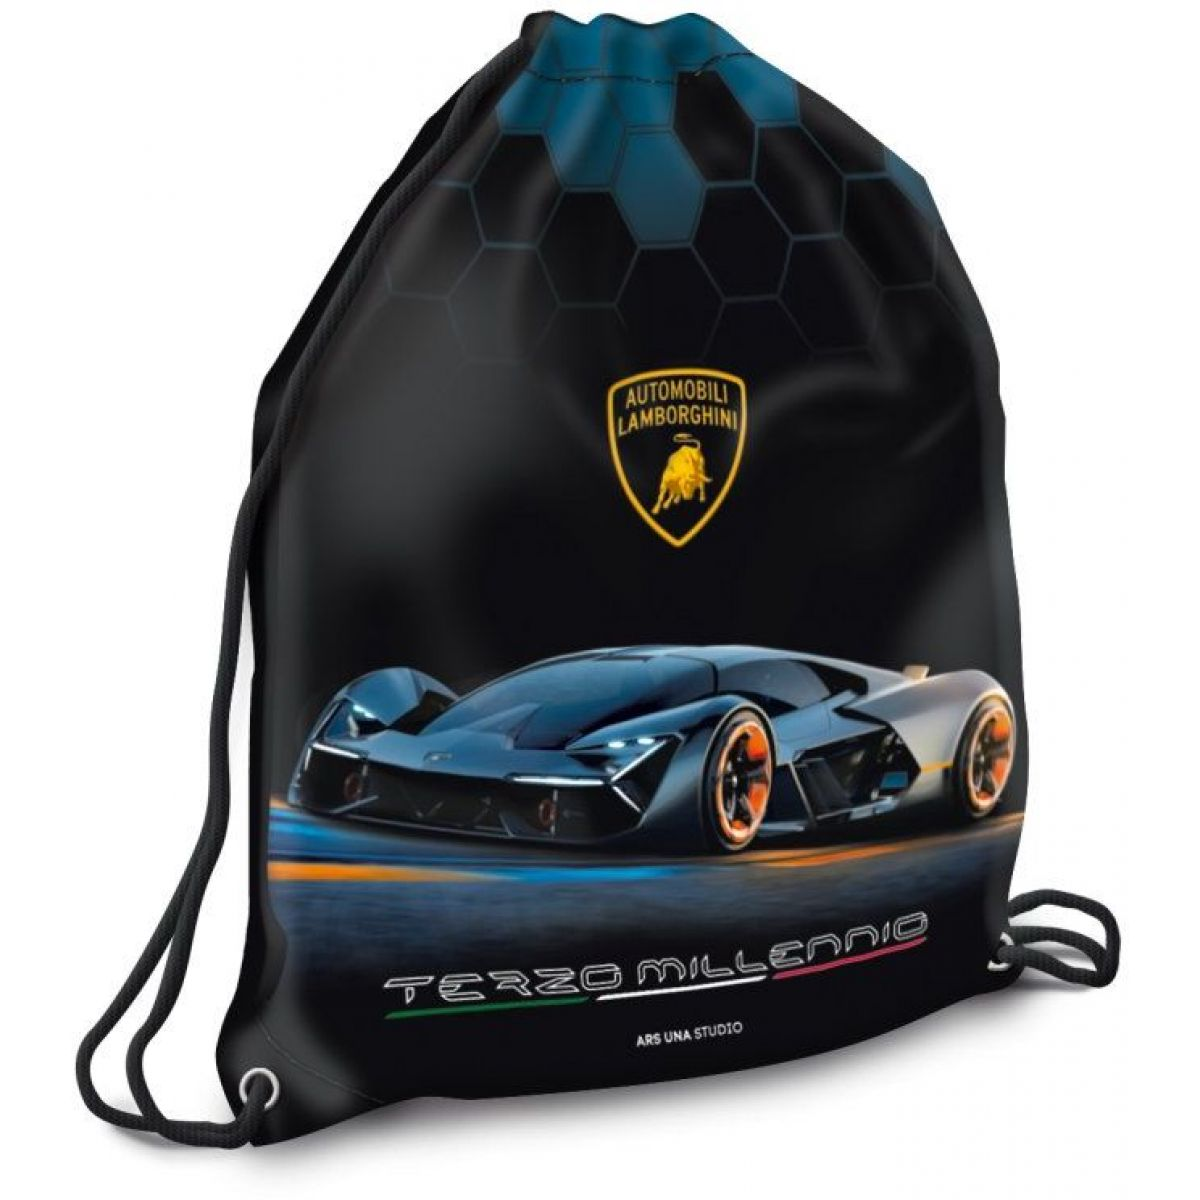 Ars Una Sáček na přezůvky Lamborghini 19